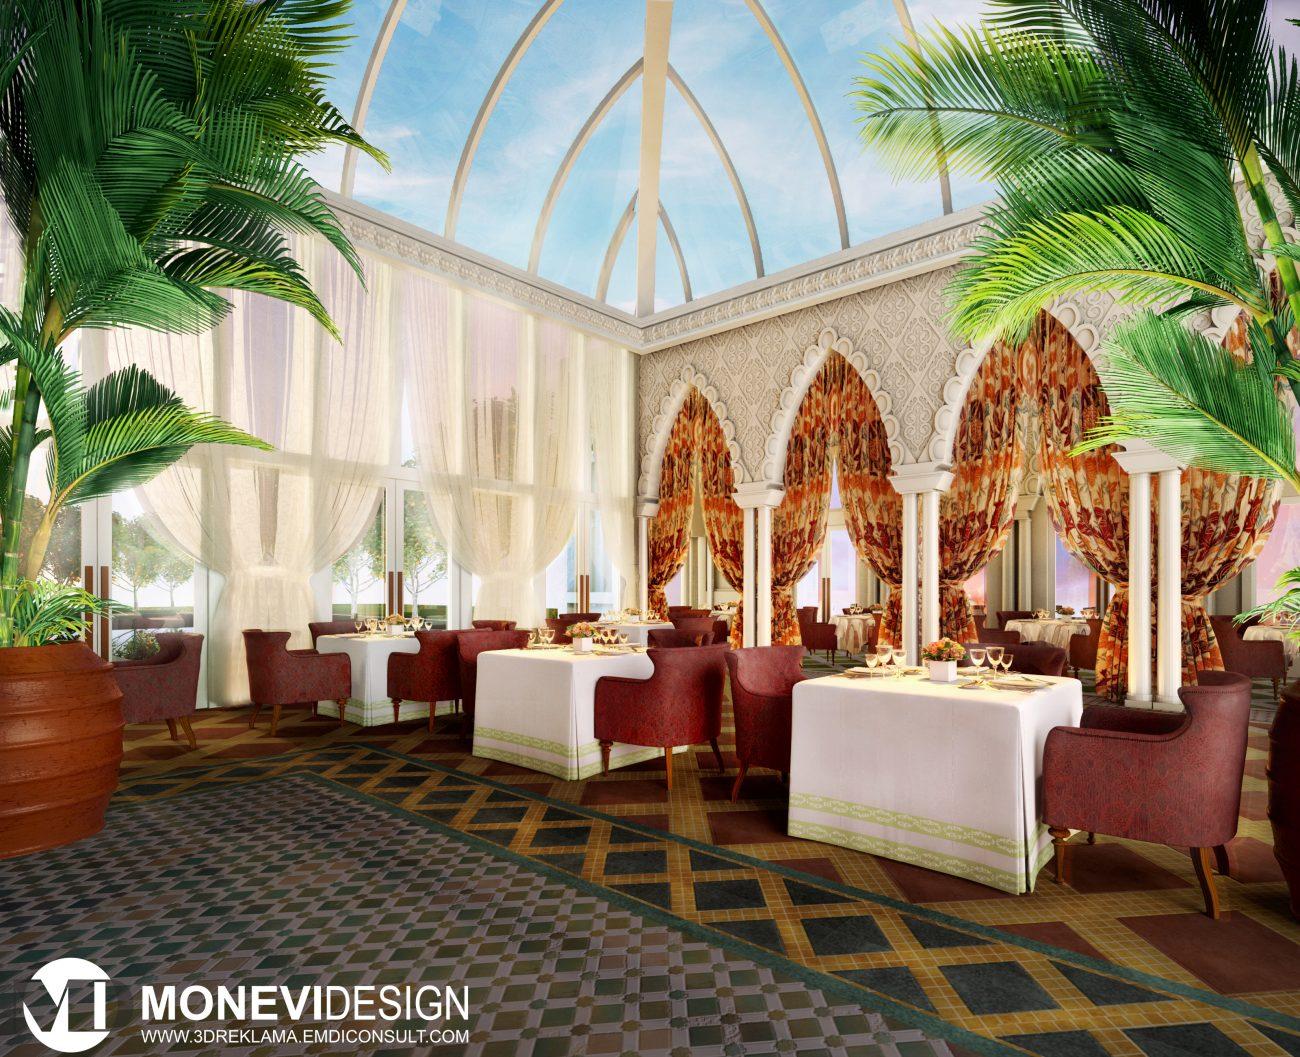 3d-rendering-restaurant-interior-final